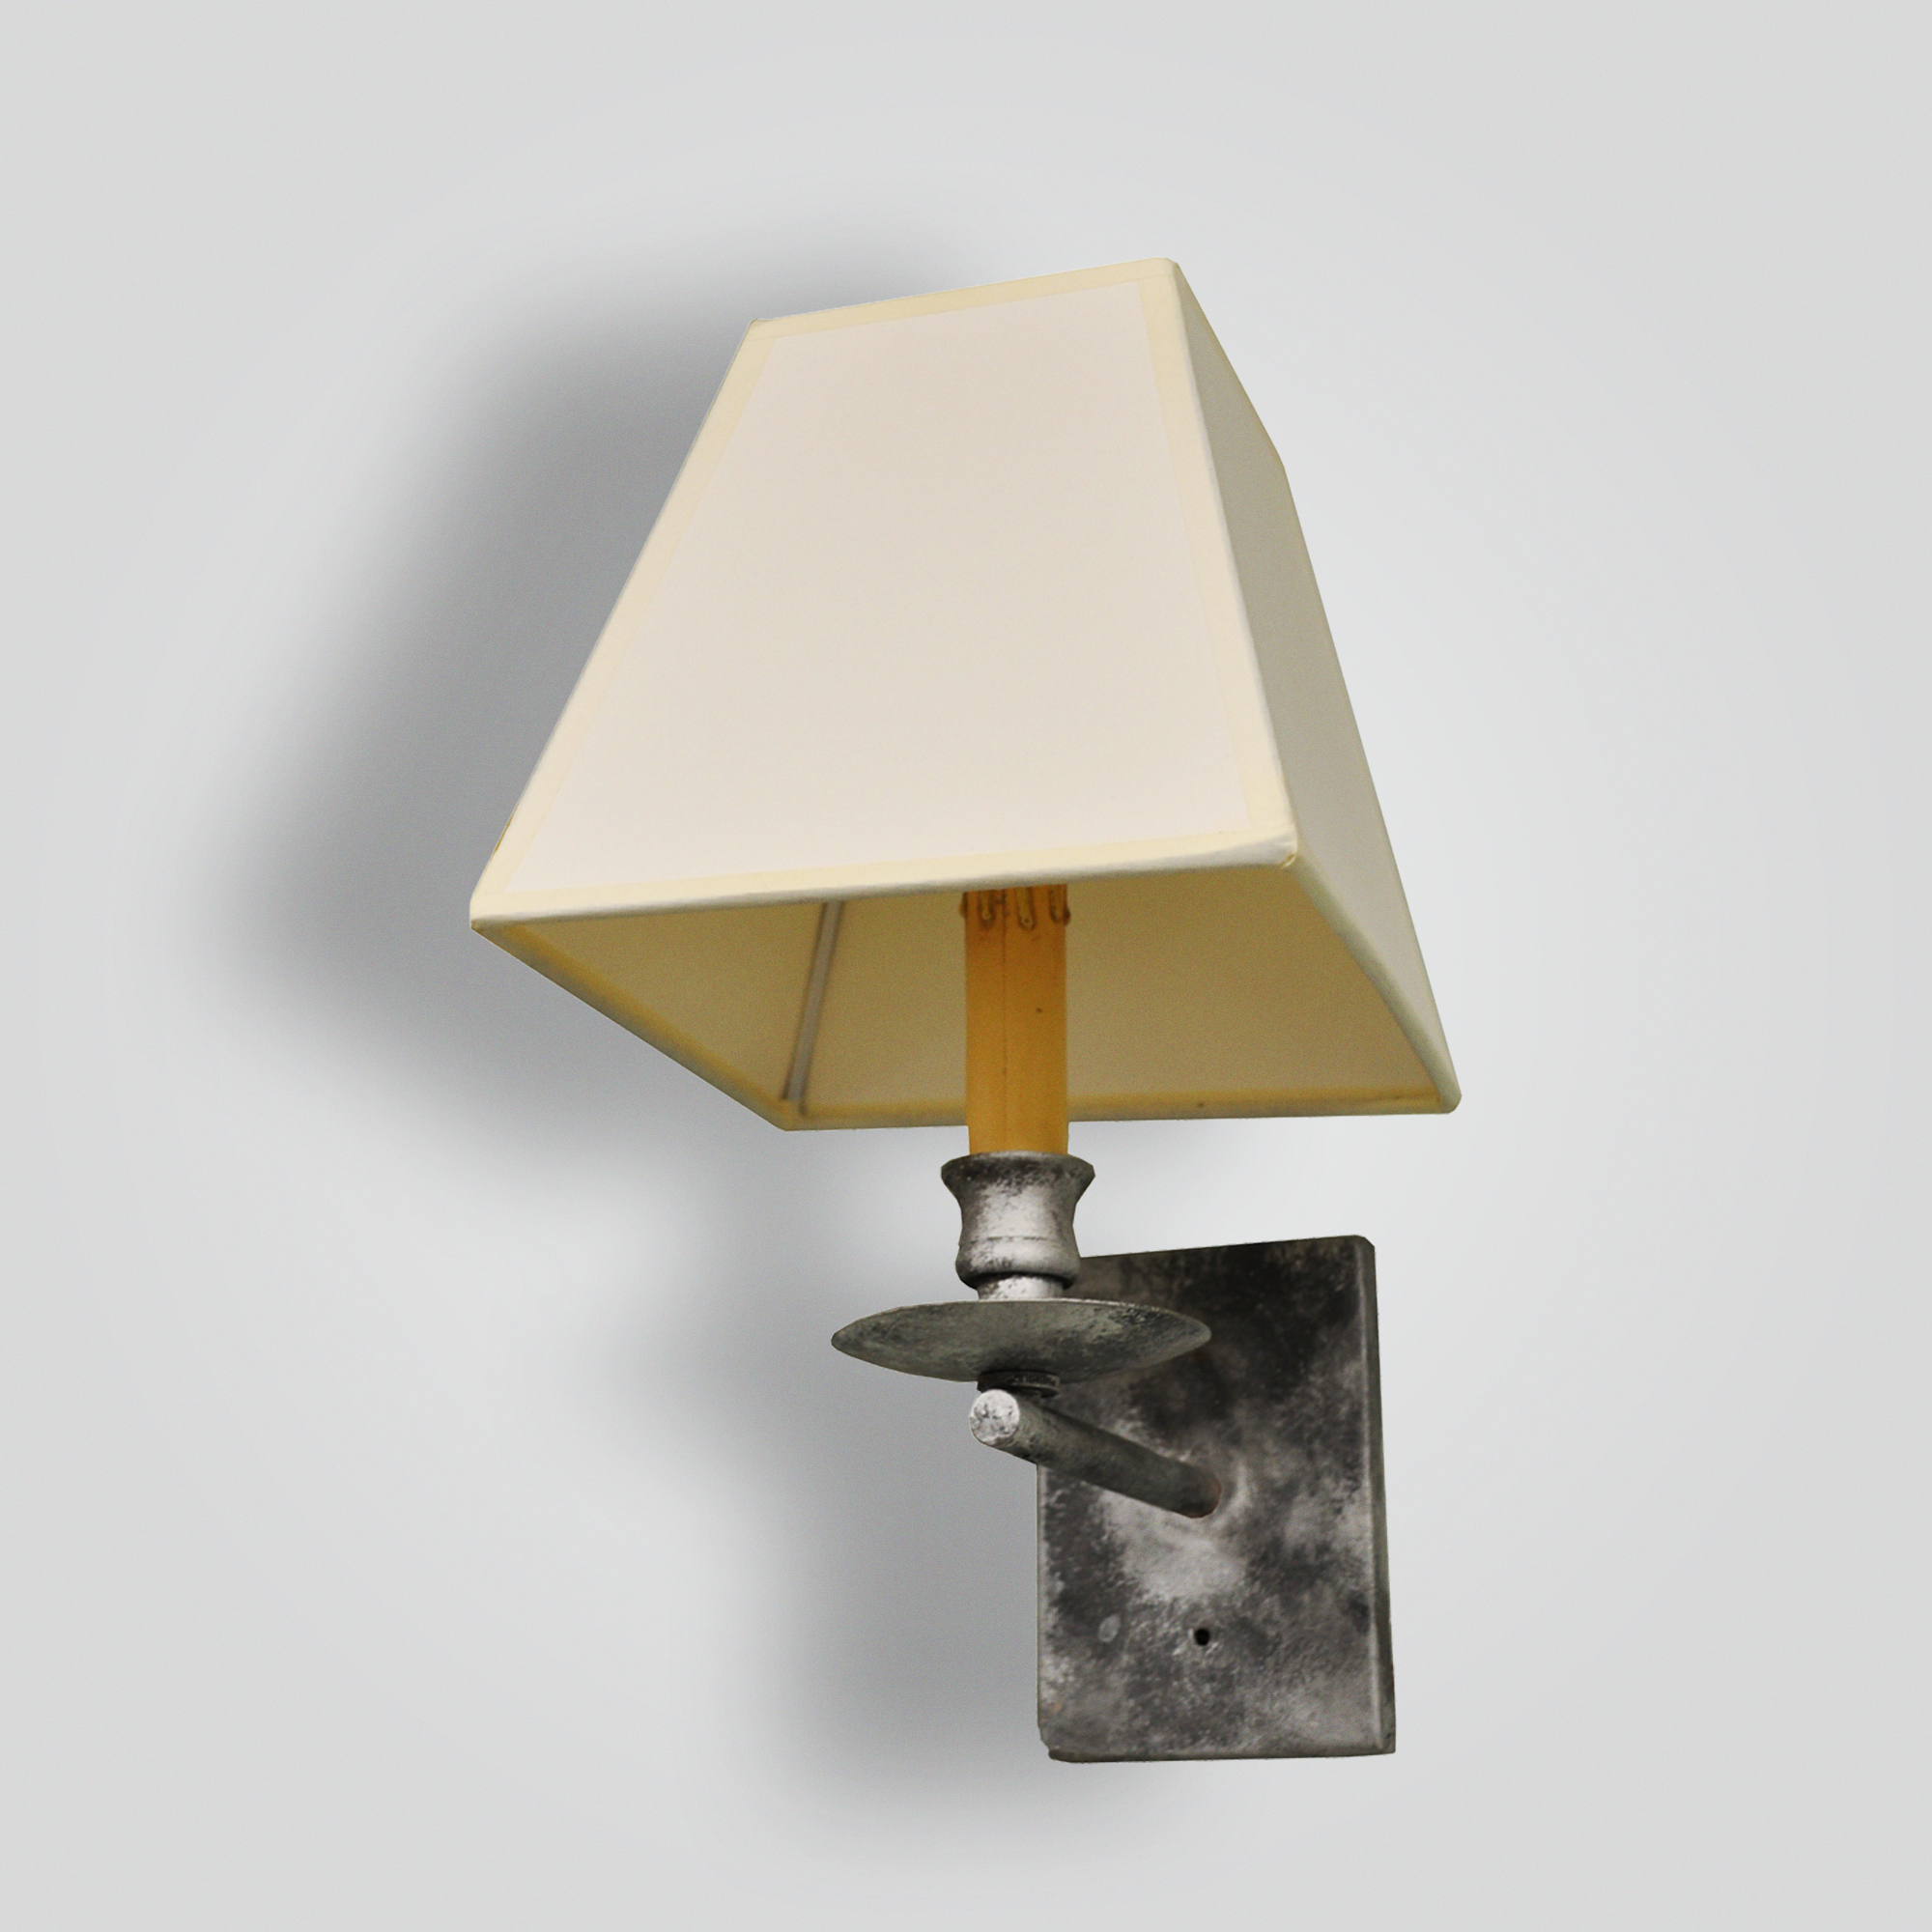 5001-cb2-ir-s-ba – ADG Lighting Collection